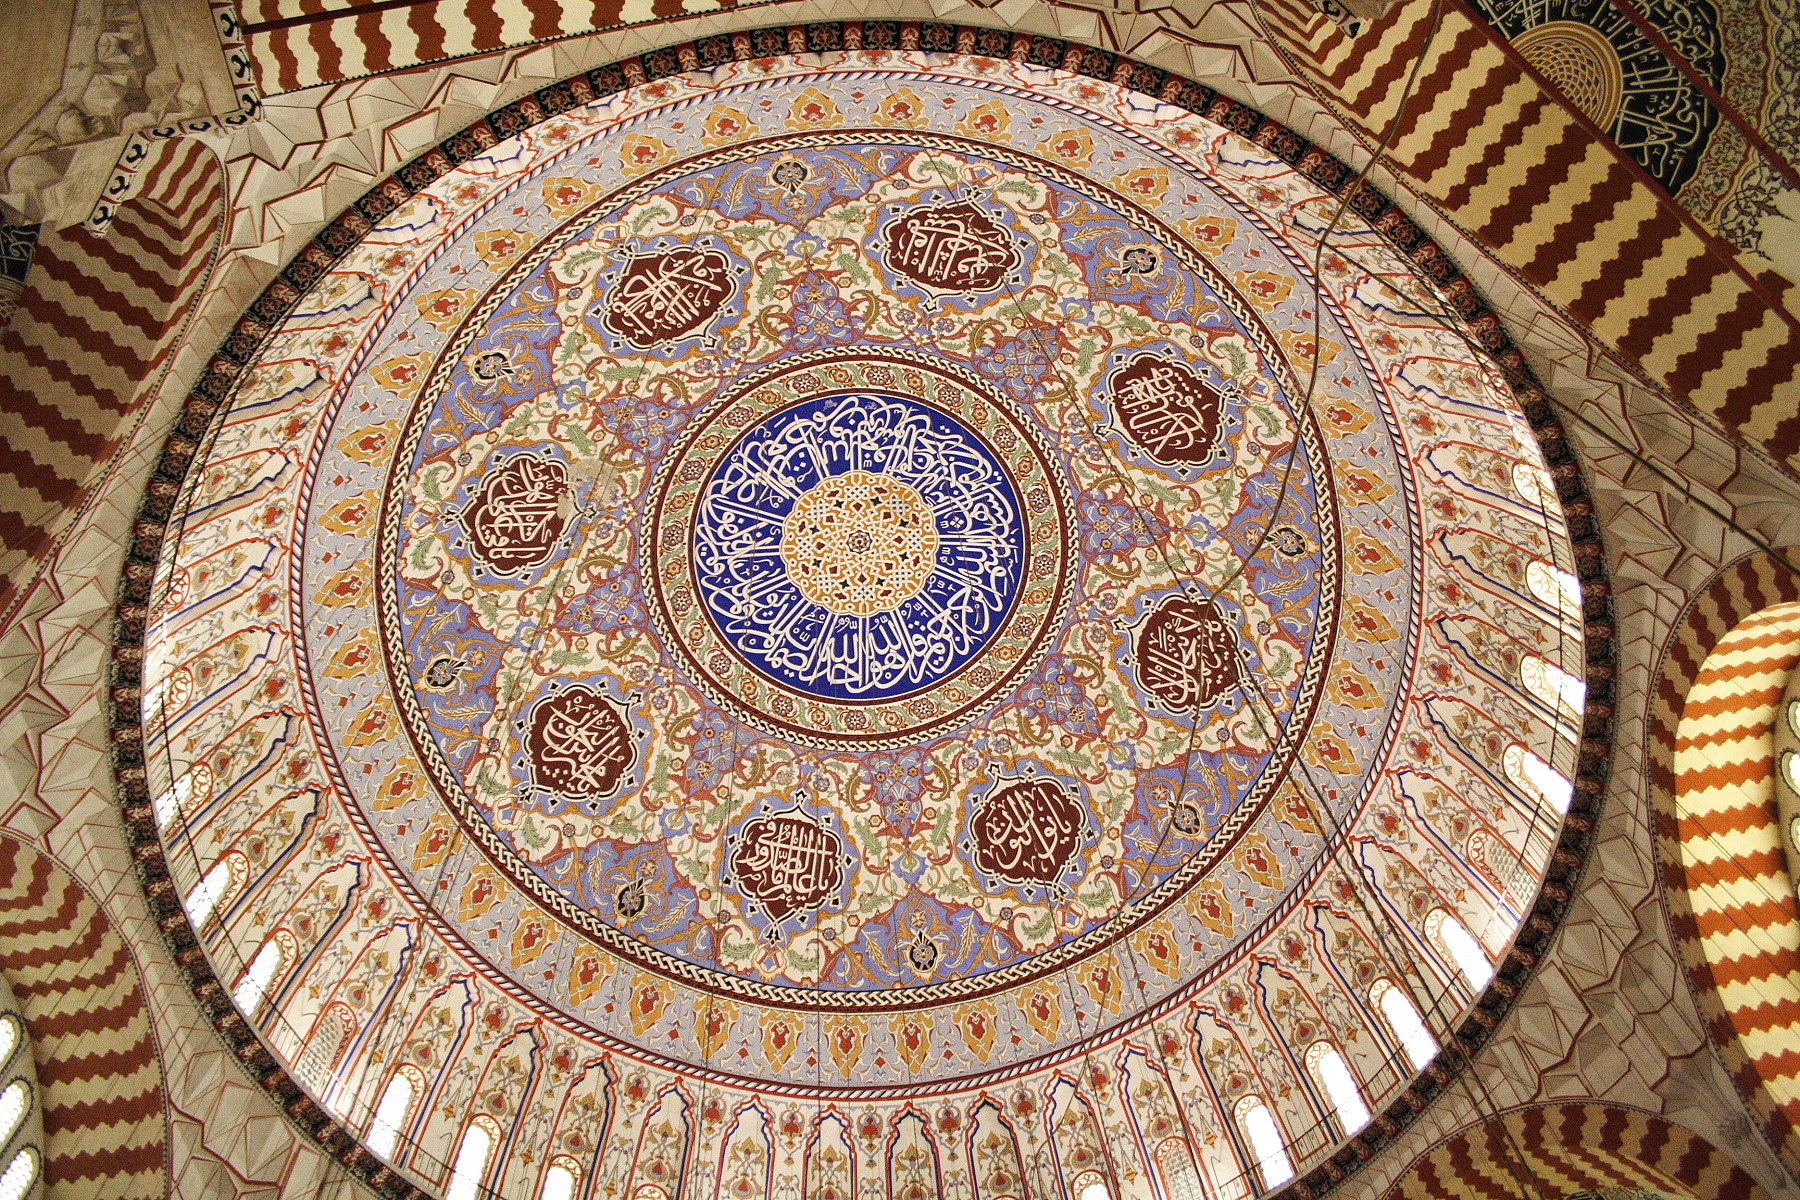 Selimiye Mosque dome in Edirne, Turkey